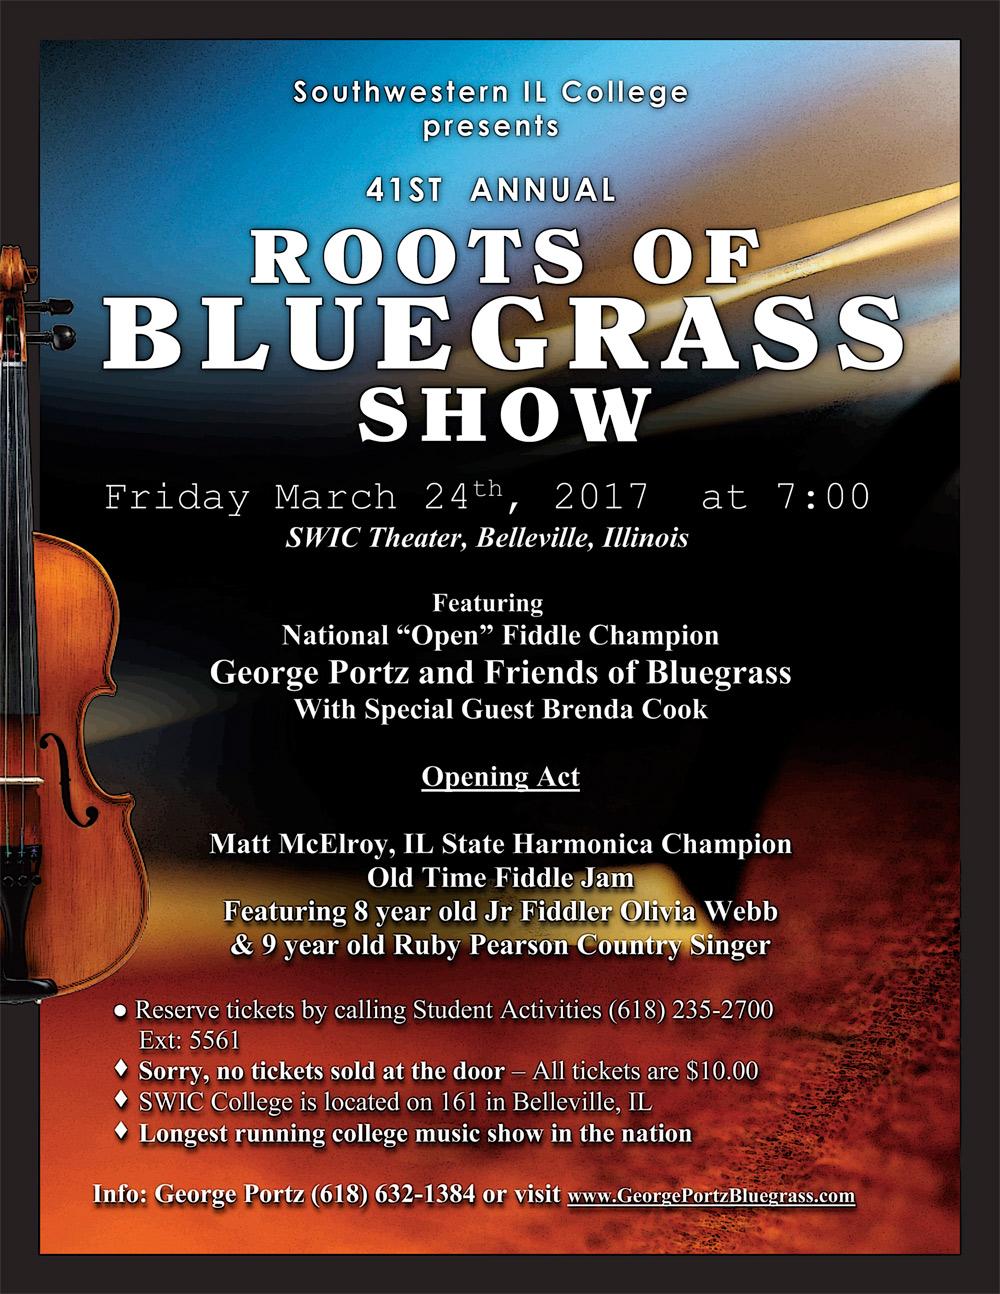 Roots of Bluegrass